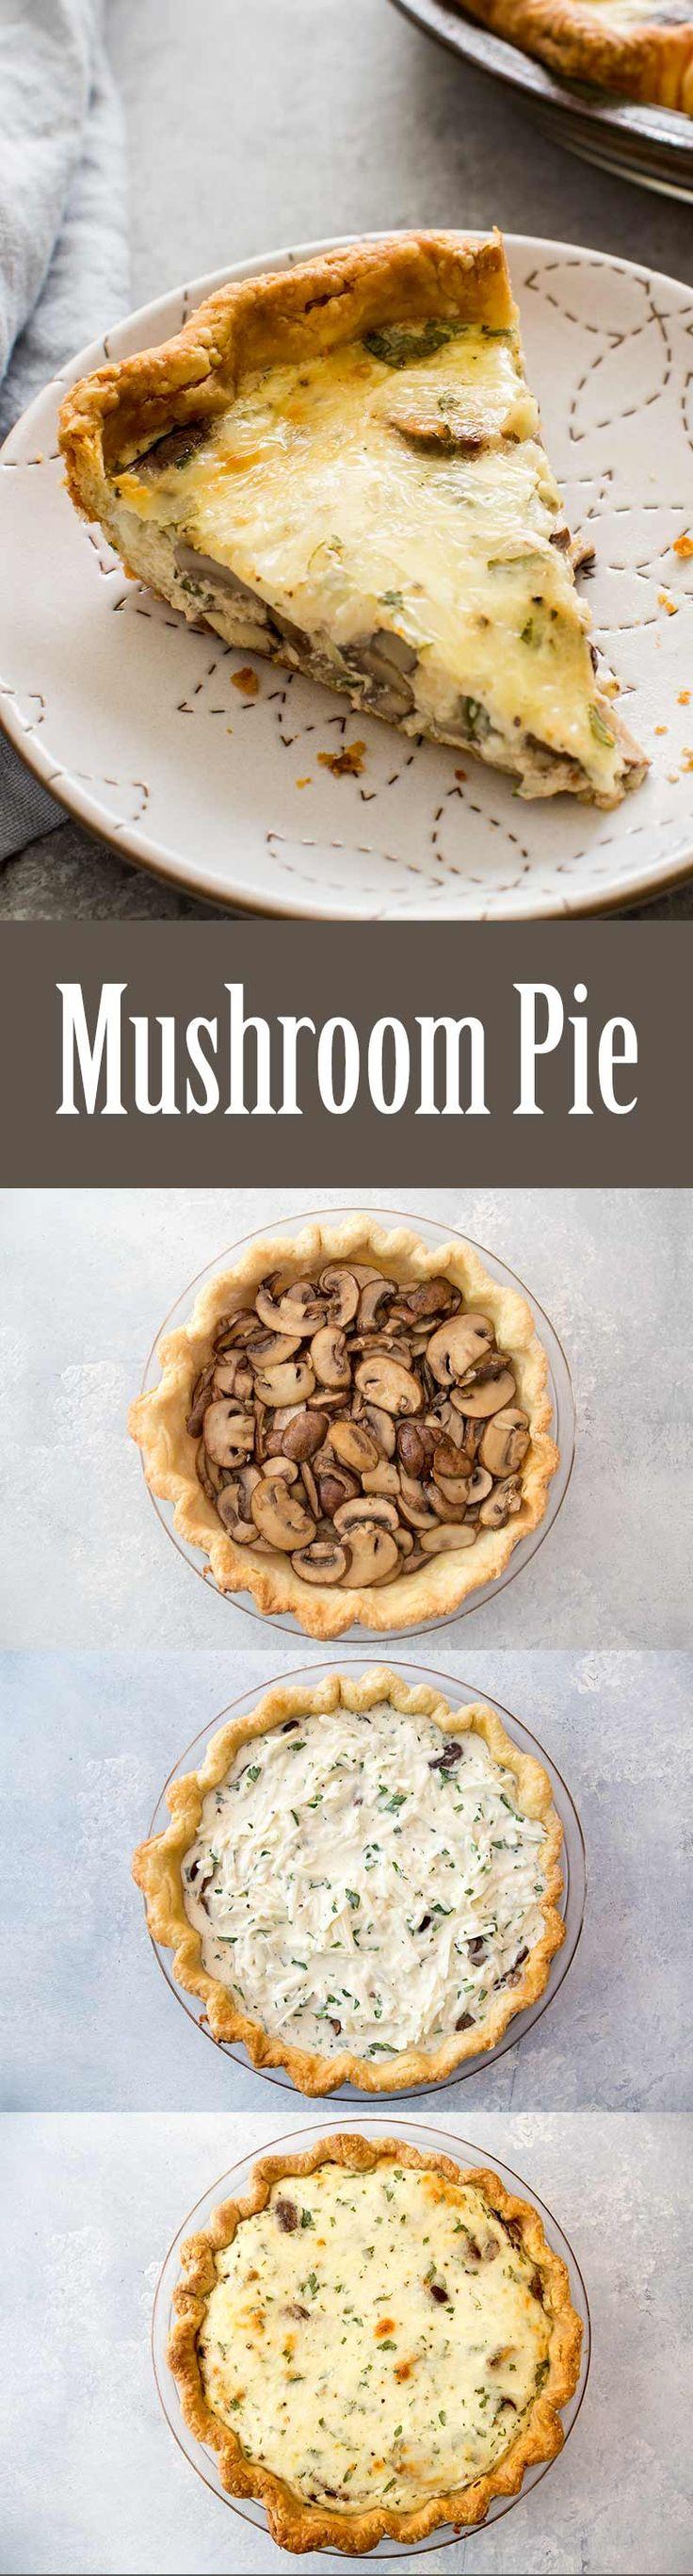 Mushroom Pie ~ Mushroom pie with fresh mushrooms, Monterey Jack cheese, sour cream, eggs, parsley, garlic, and cream. ~ SimplyRecipes.com